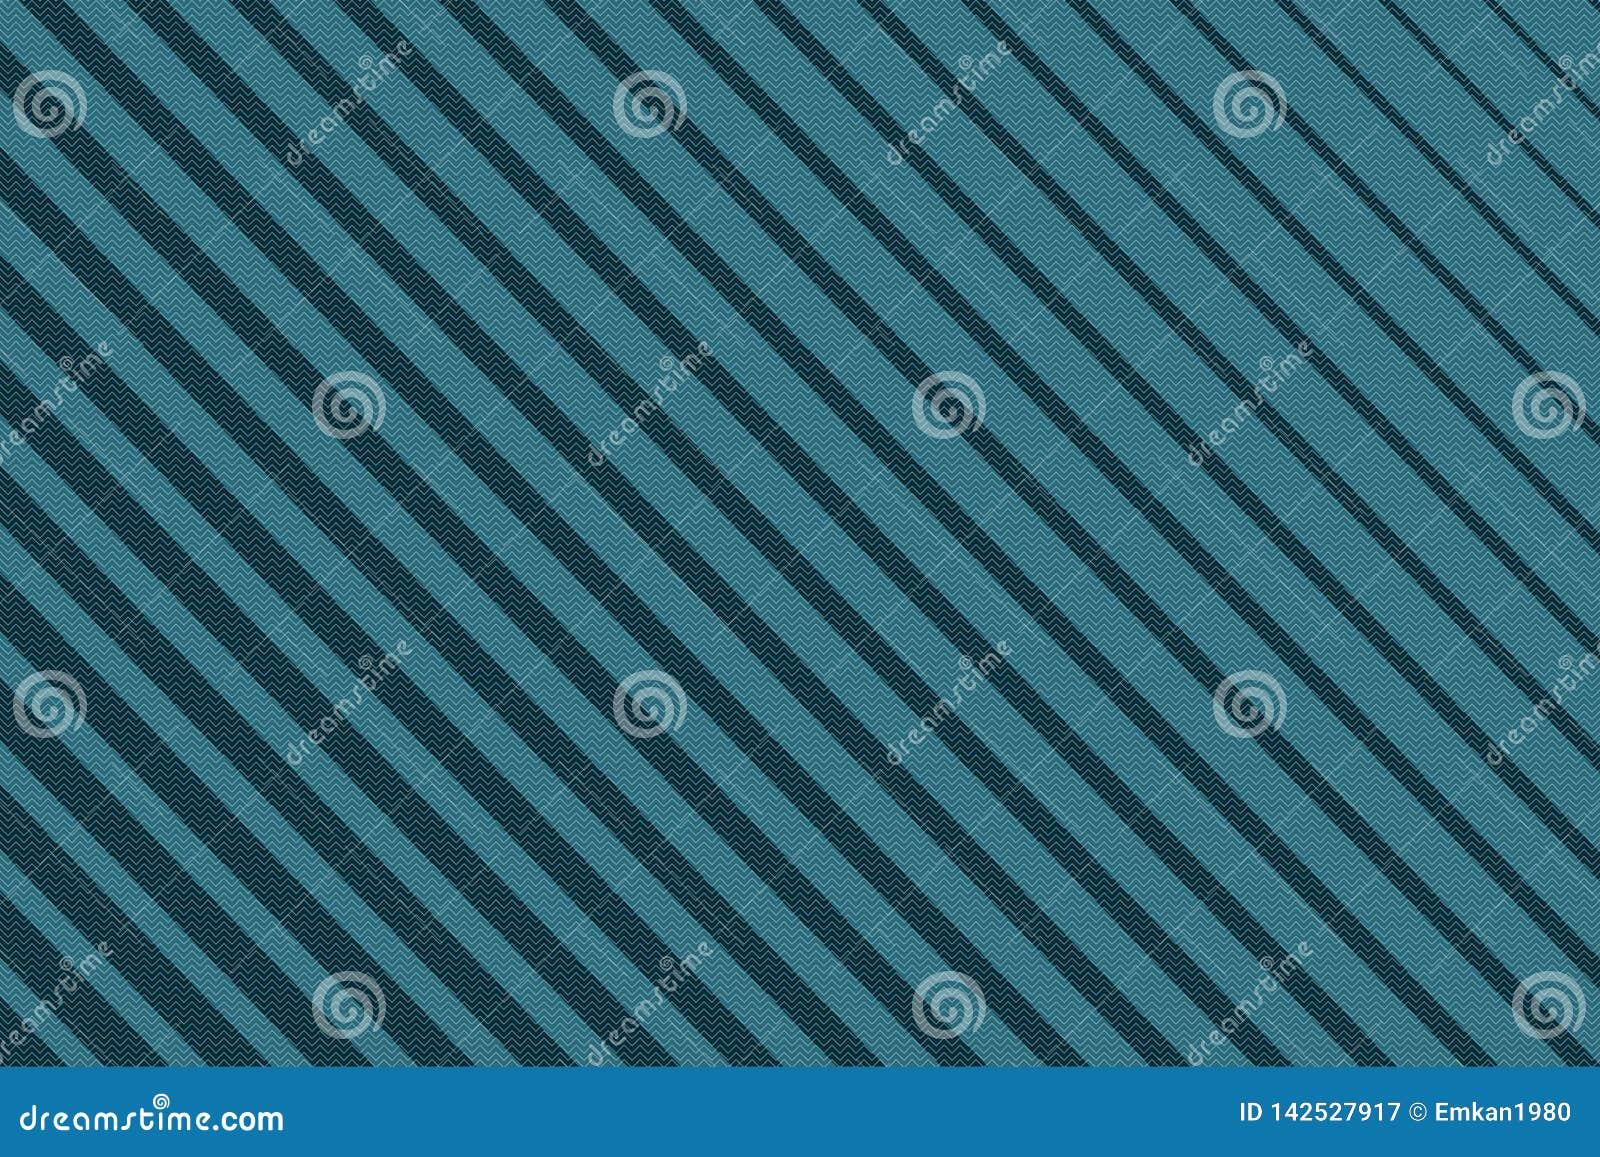 Cotton Fabric Texture Stripes Stock Photo